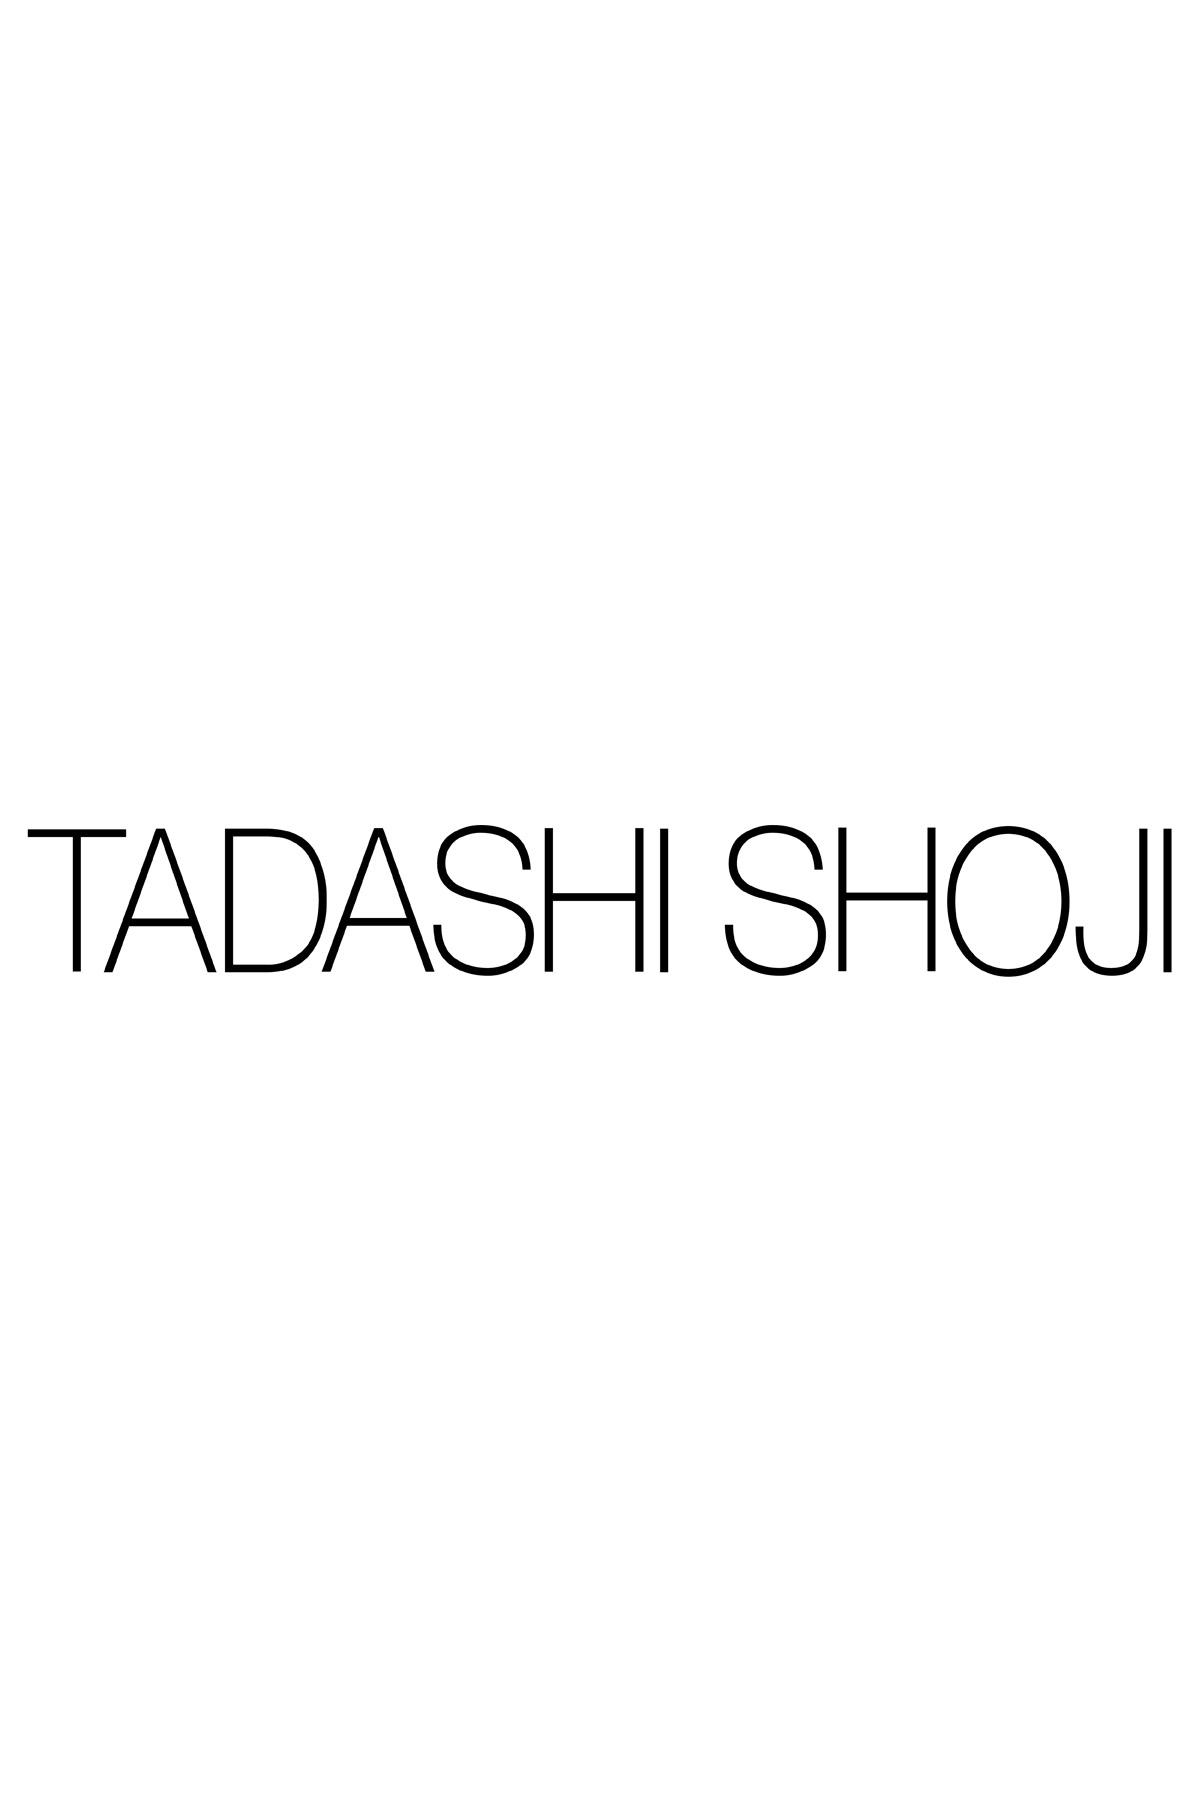 Avitulita Pintuck Dress